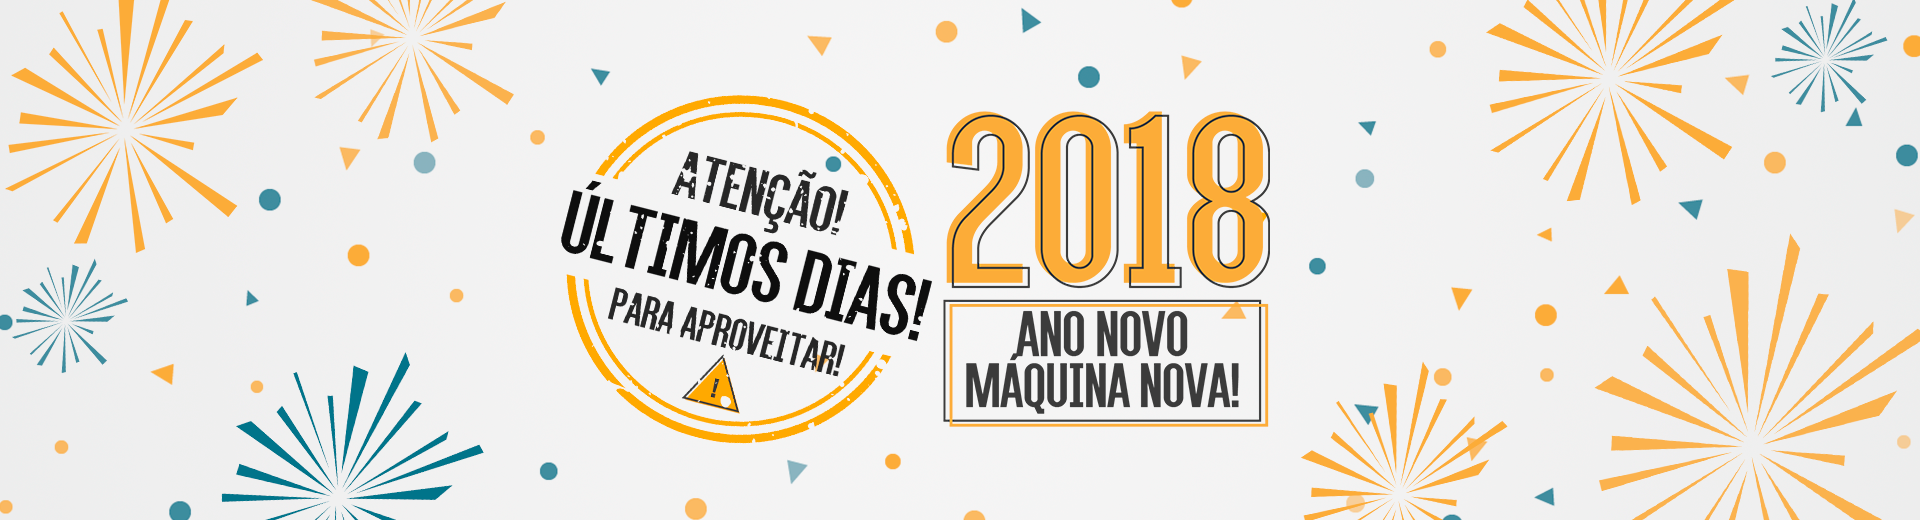 Ano Novo, Máquina Nova